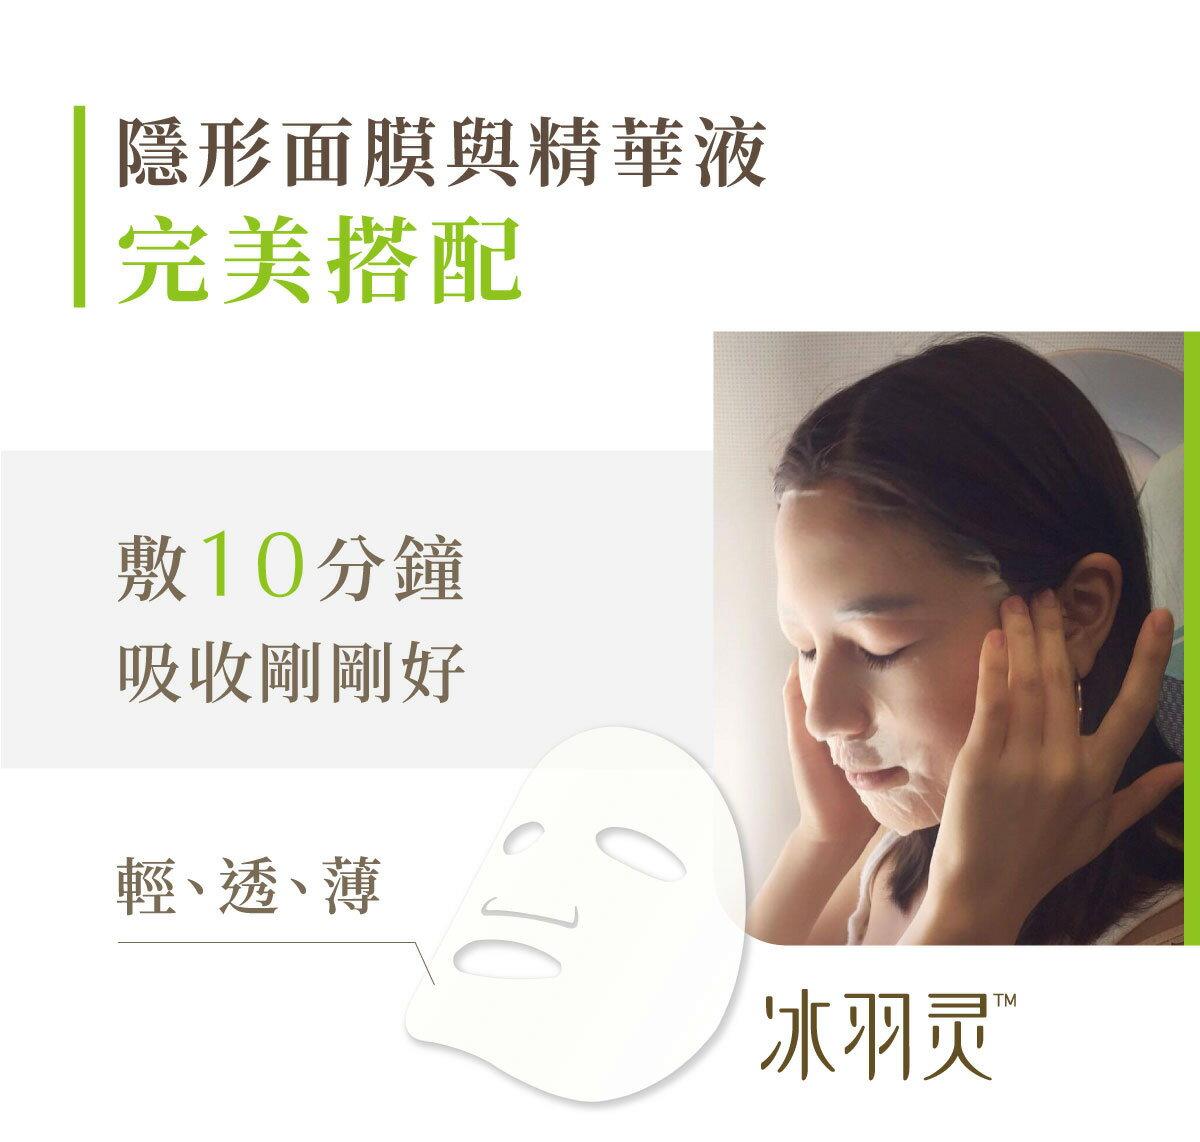 MIT👍滿額贈♥️【Inna Organic 童顏有機】沒藥水潤淨化隱形面膜 (1片) 7